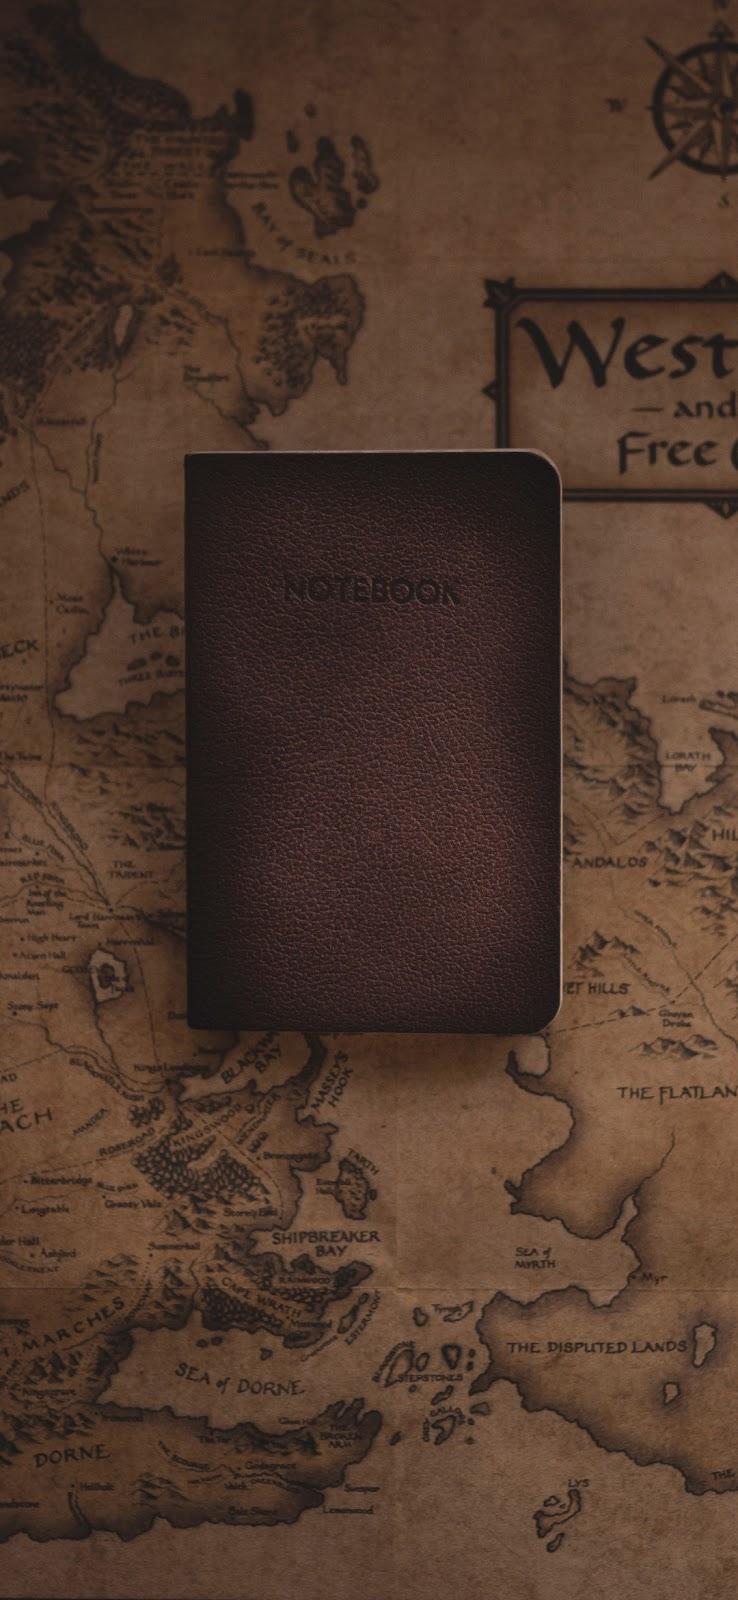 vintage notebook on map wallpaper